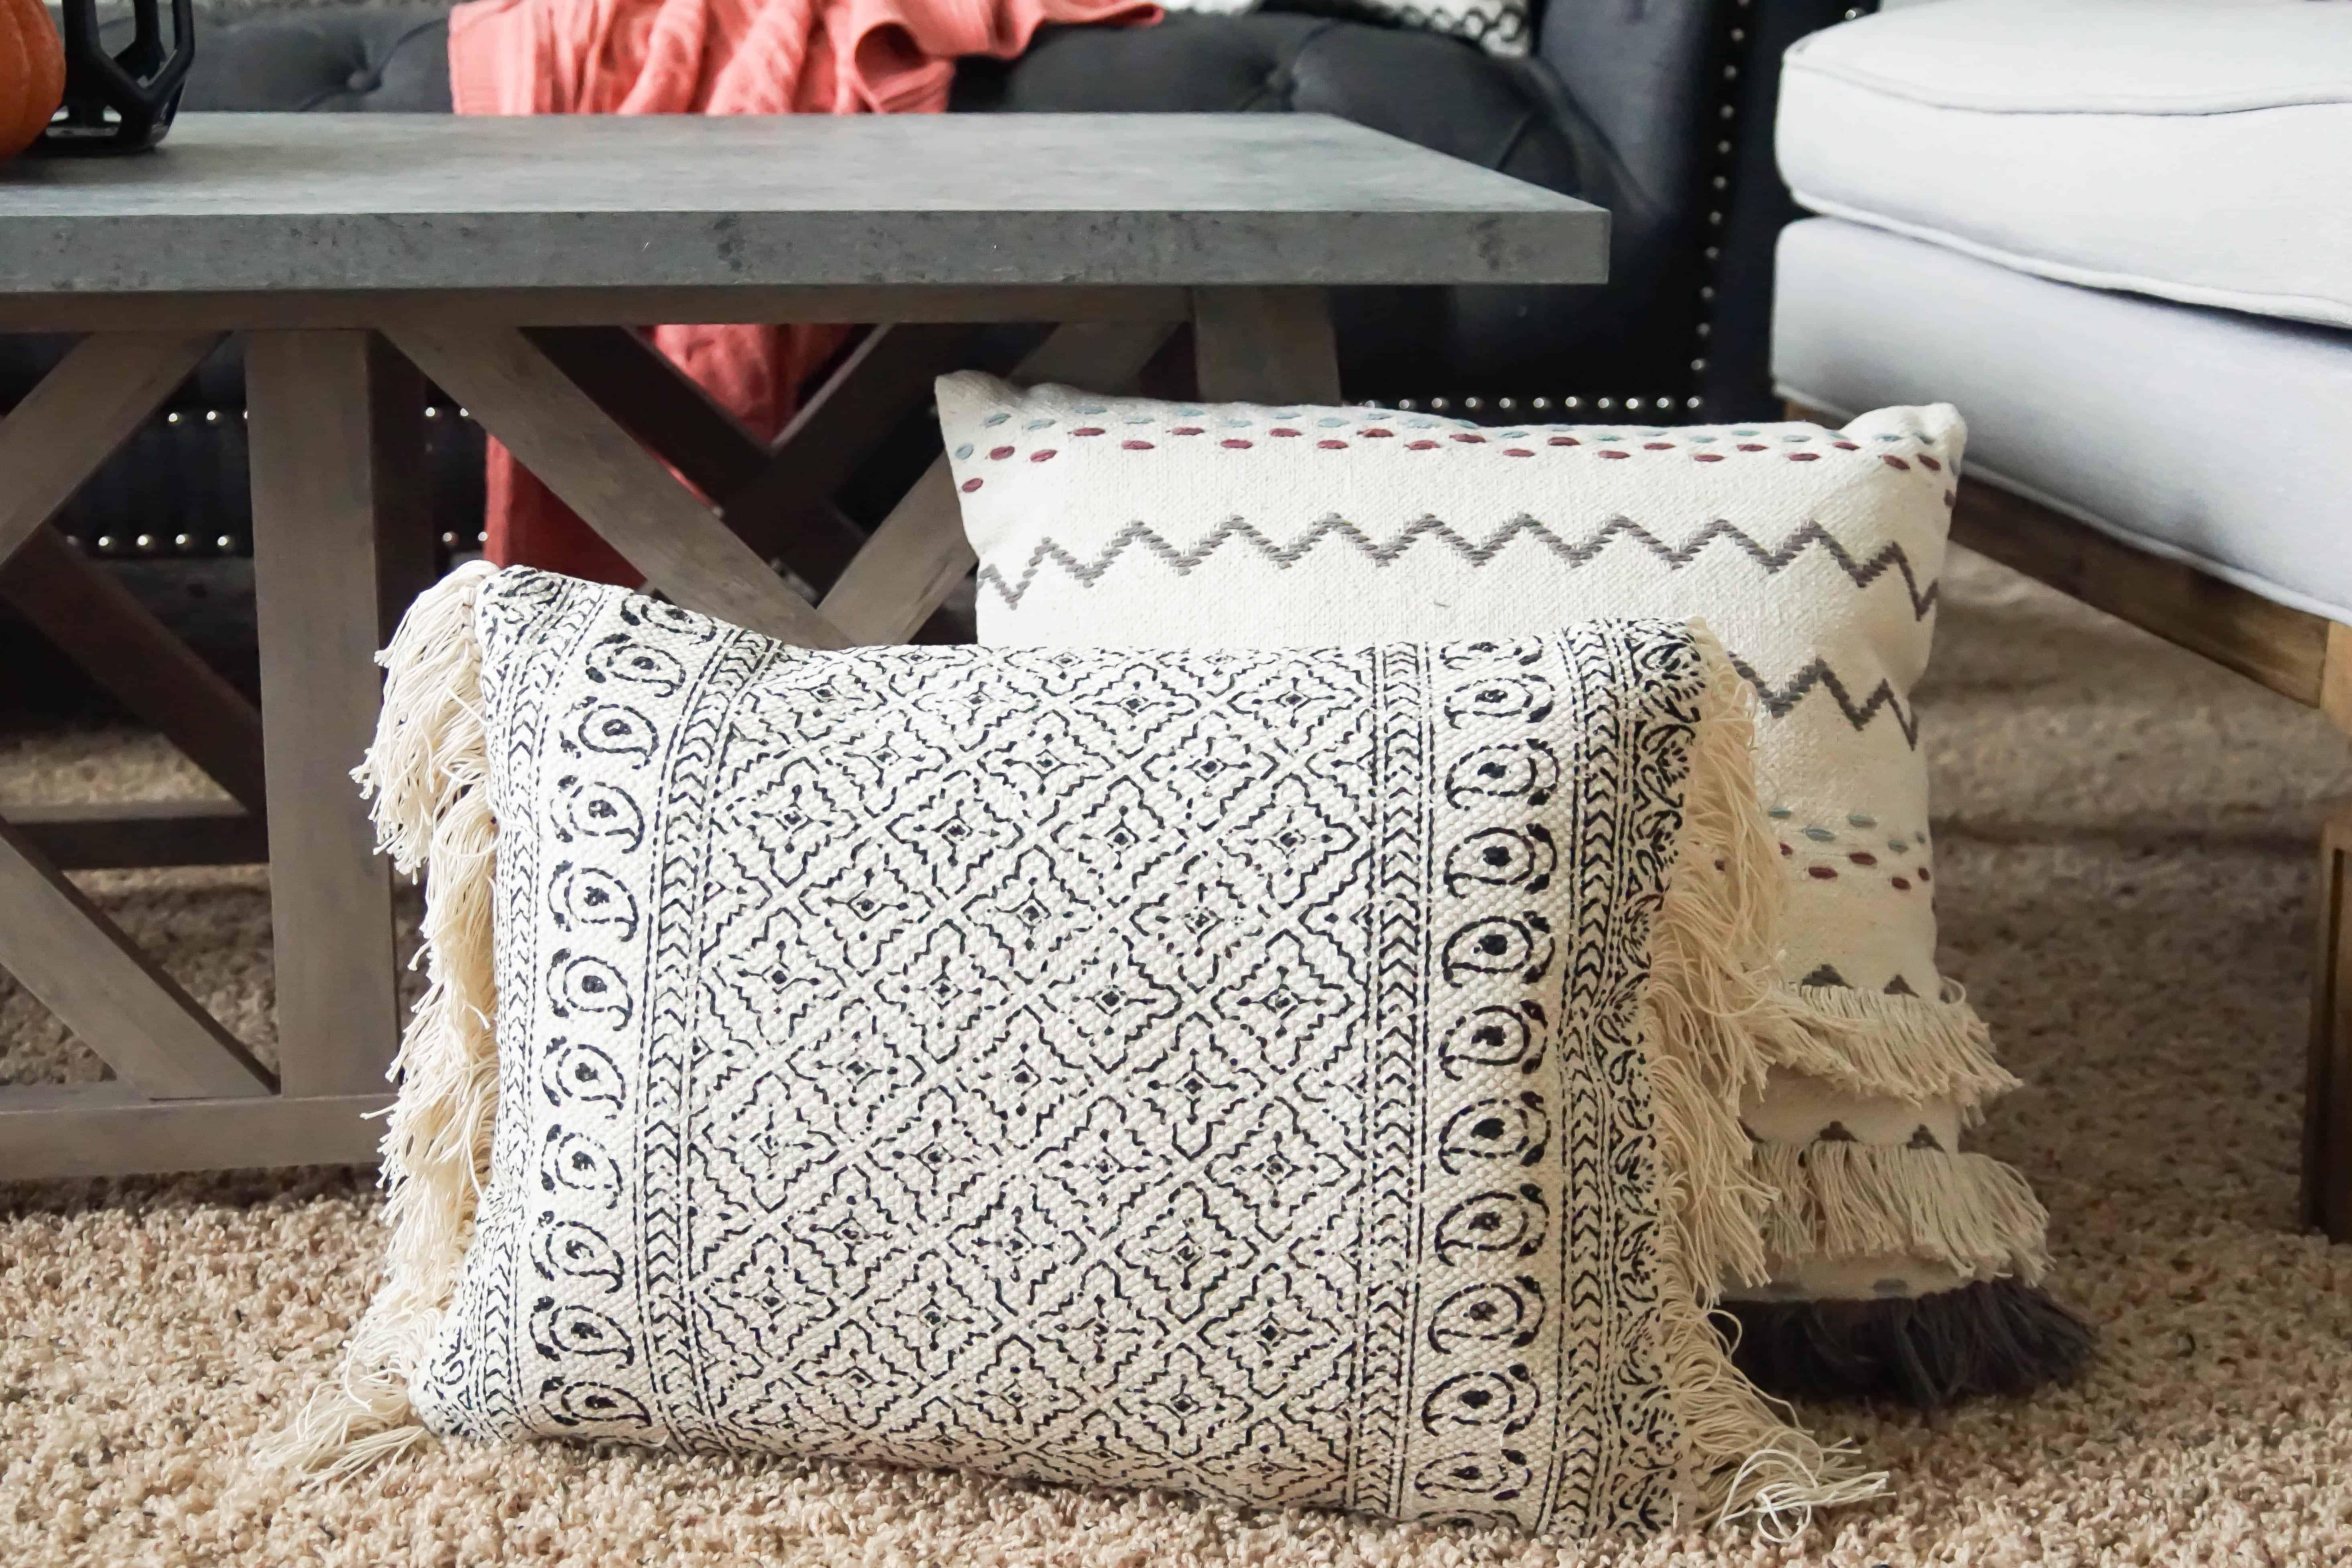 extra pillows on floor